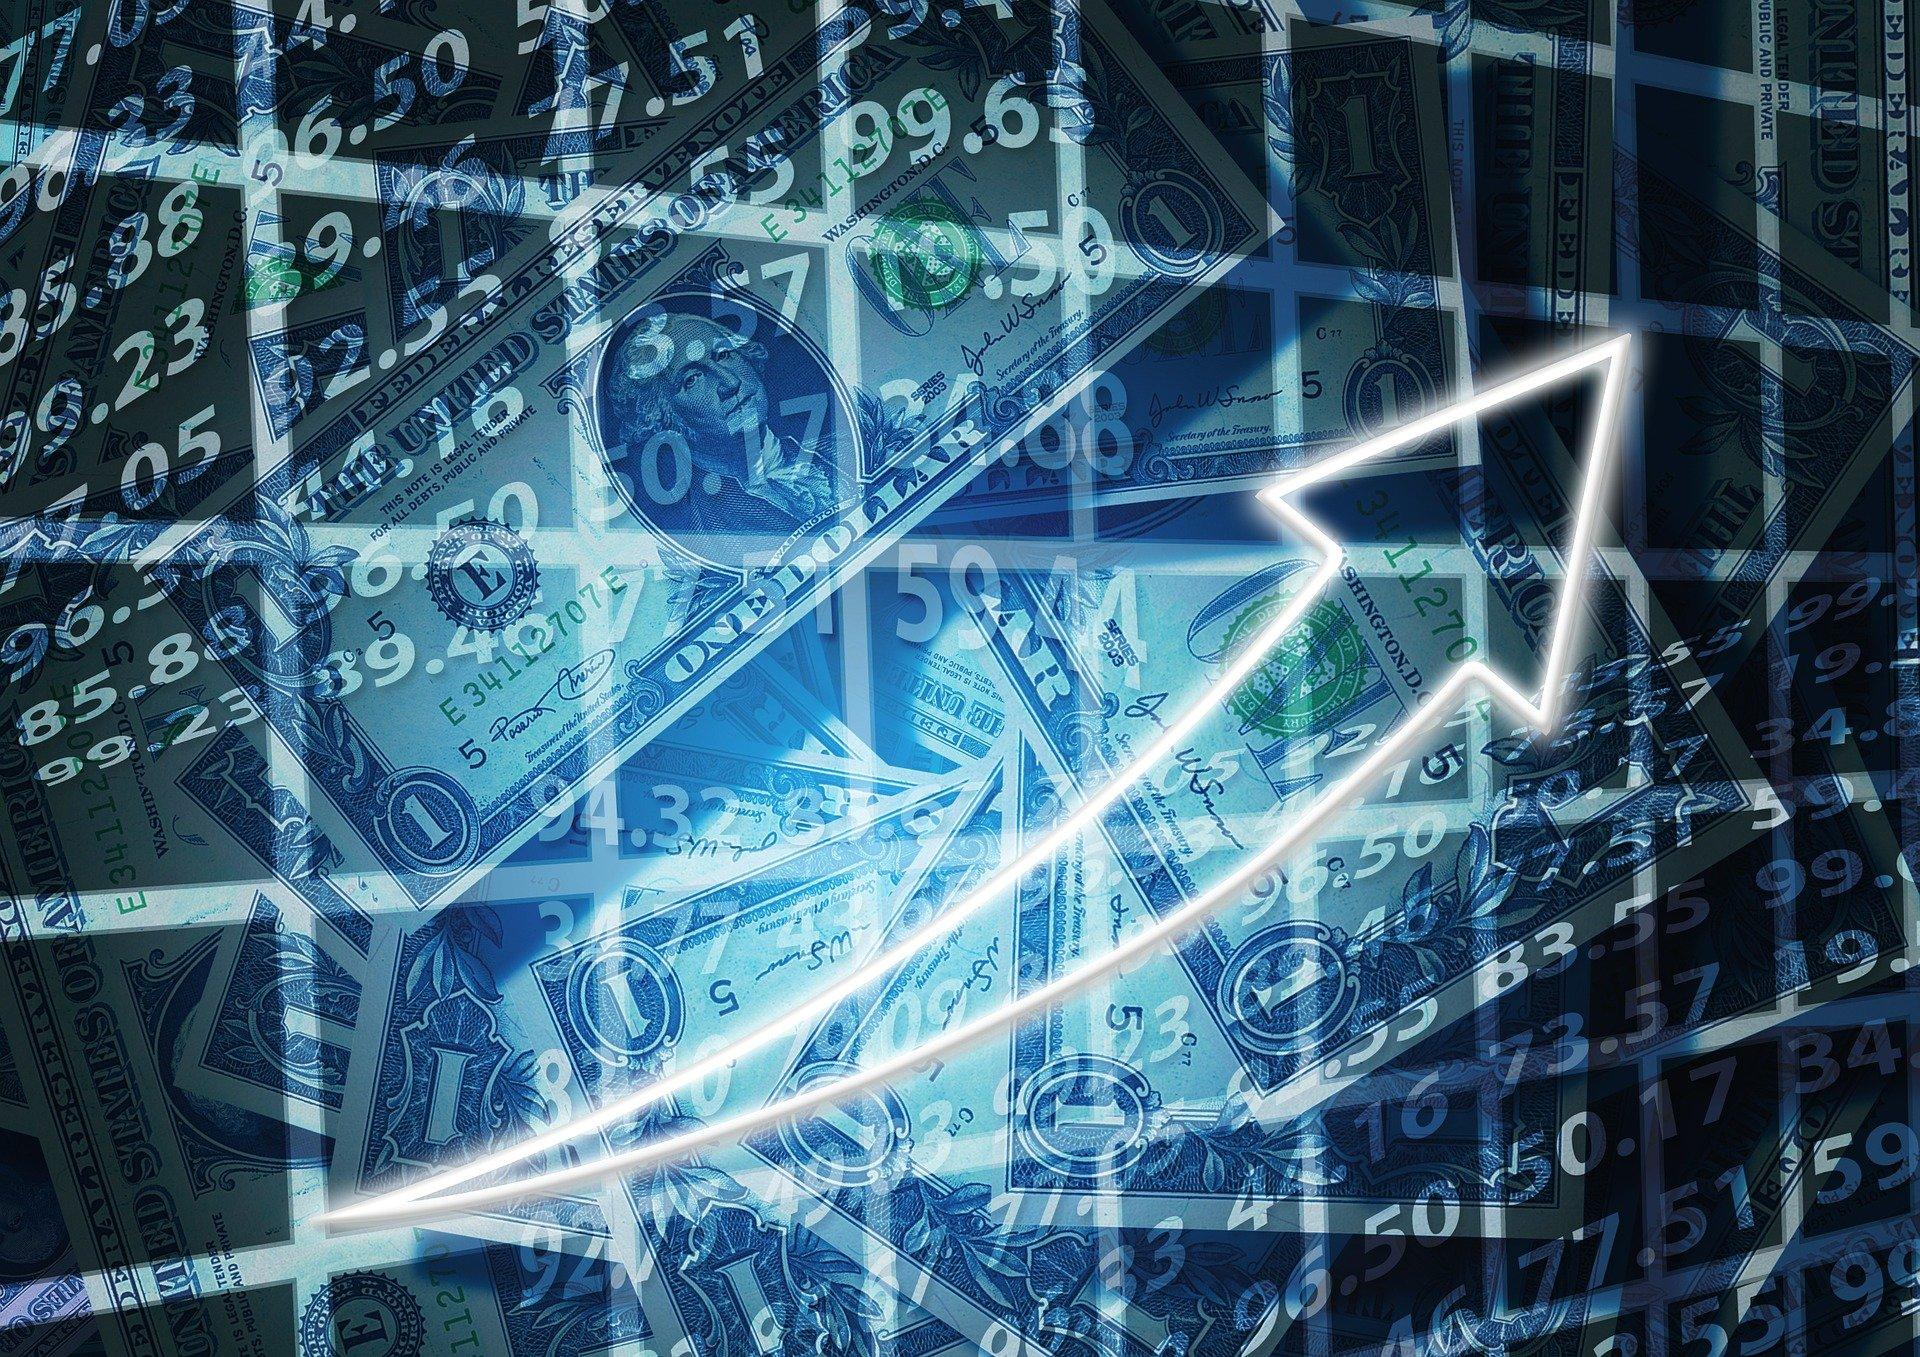 Economía mundial repuntará 4.5%: Mapfre Economics